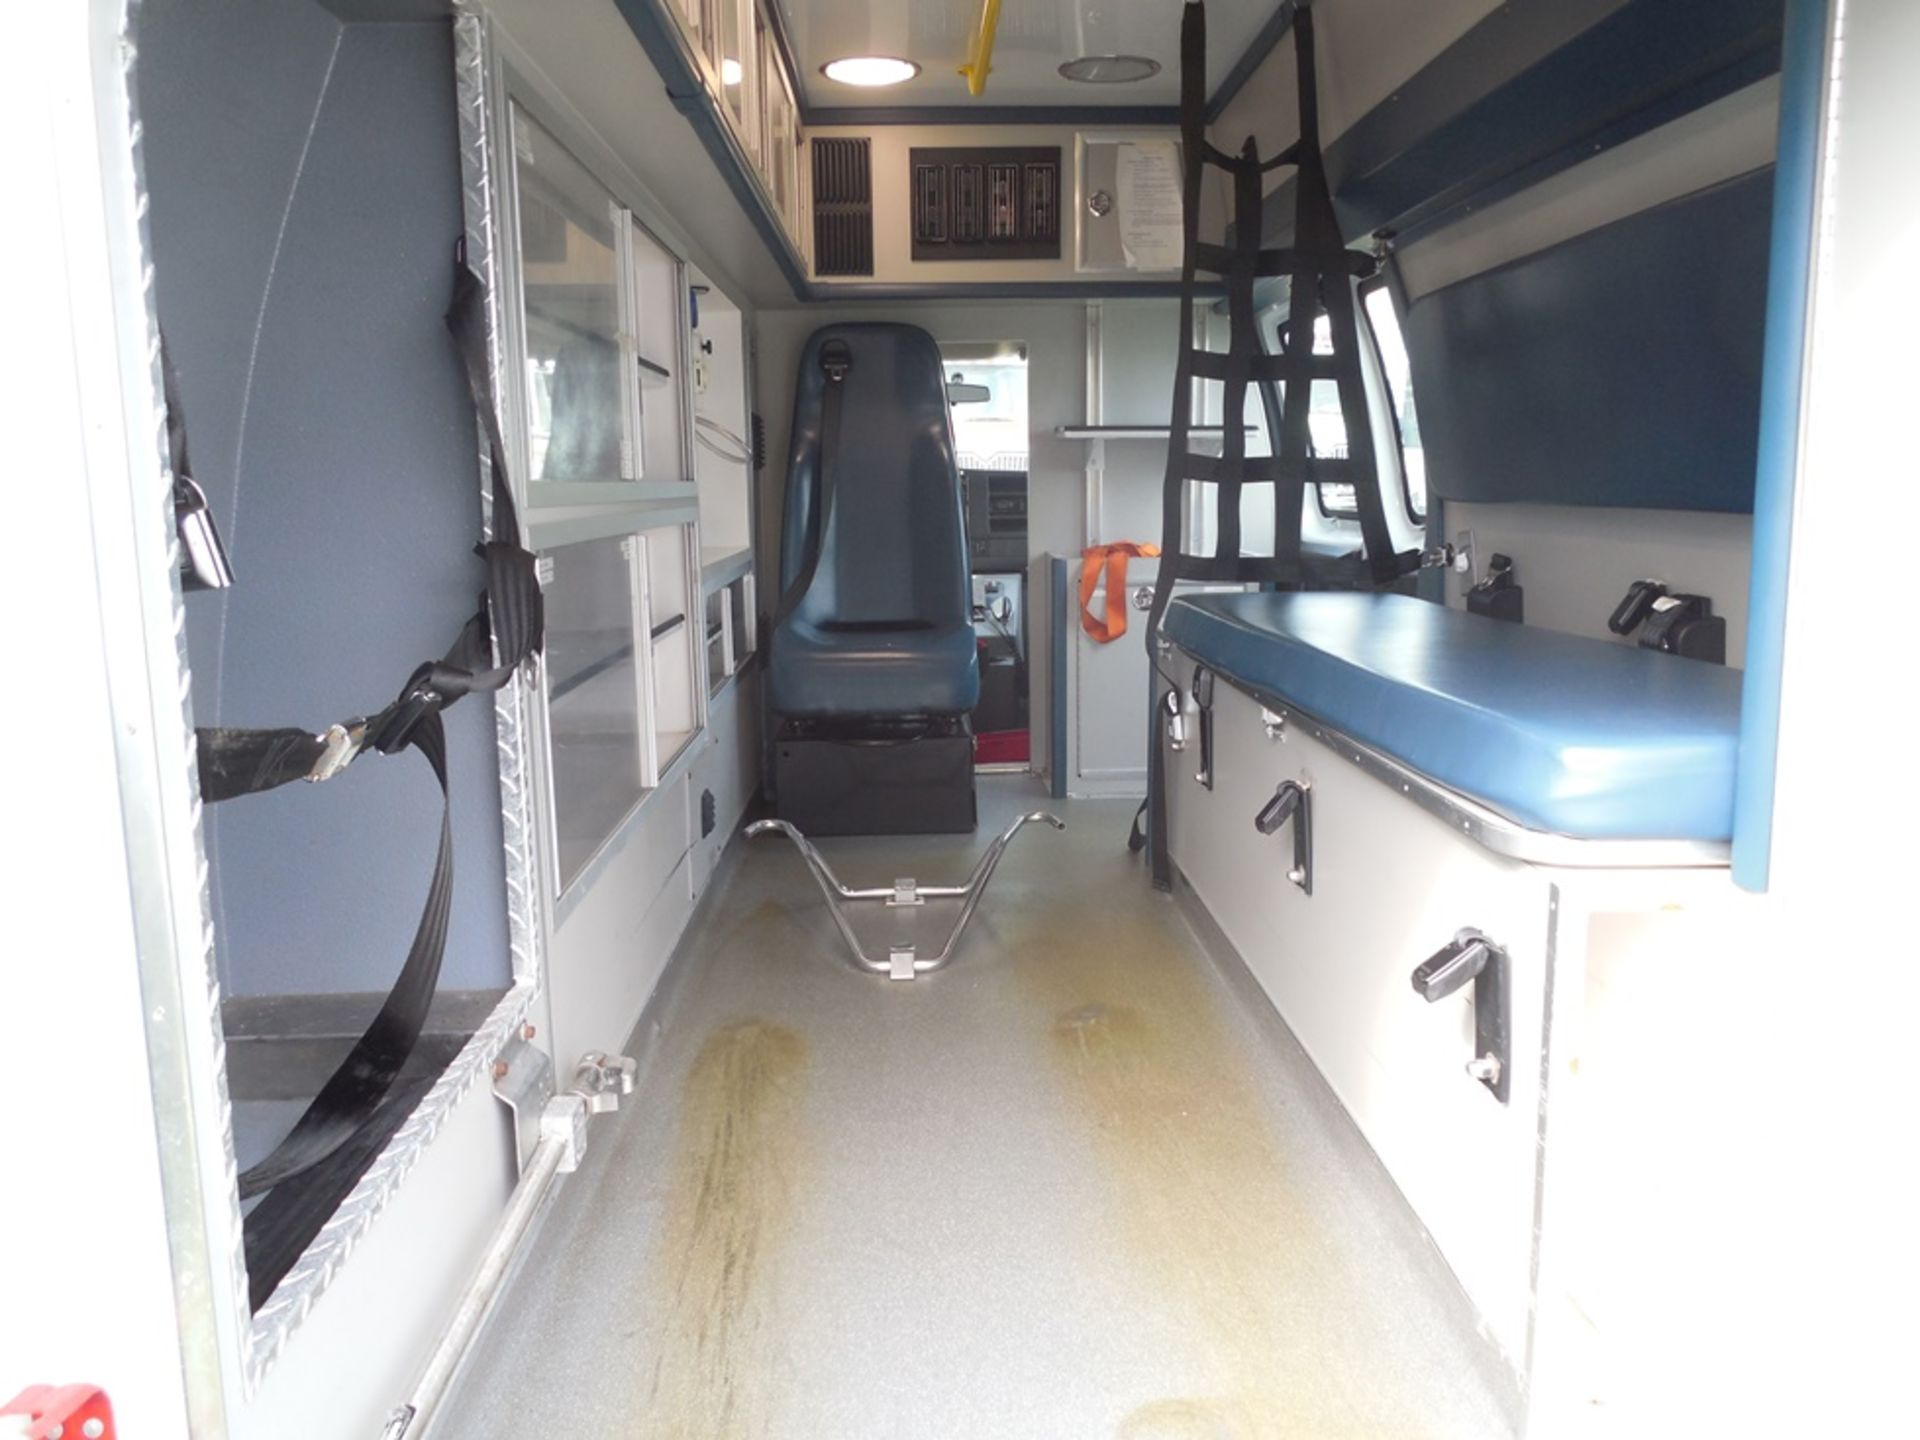 2014 Chev van ambulance dsl, 172,472 miles, vin# 1GBZGUC19E1162022 - Image 6 of 6